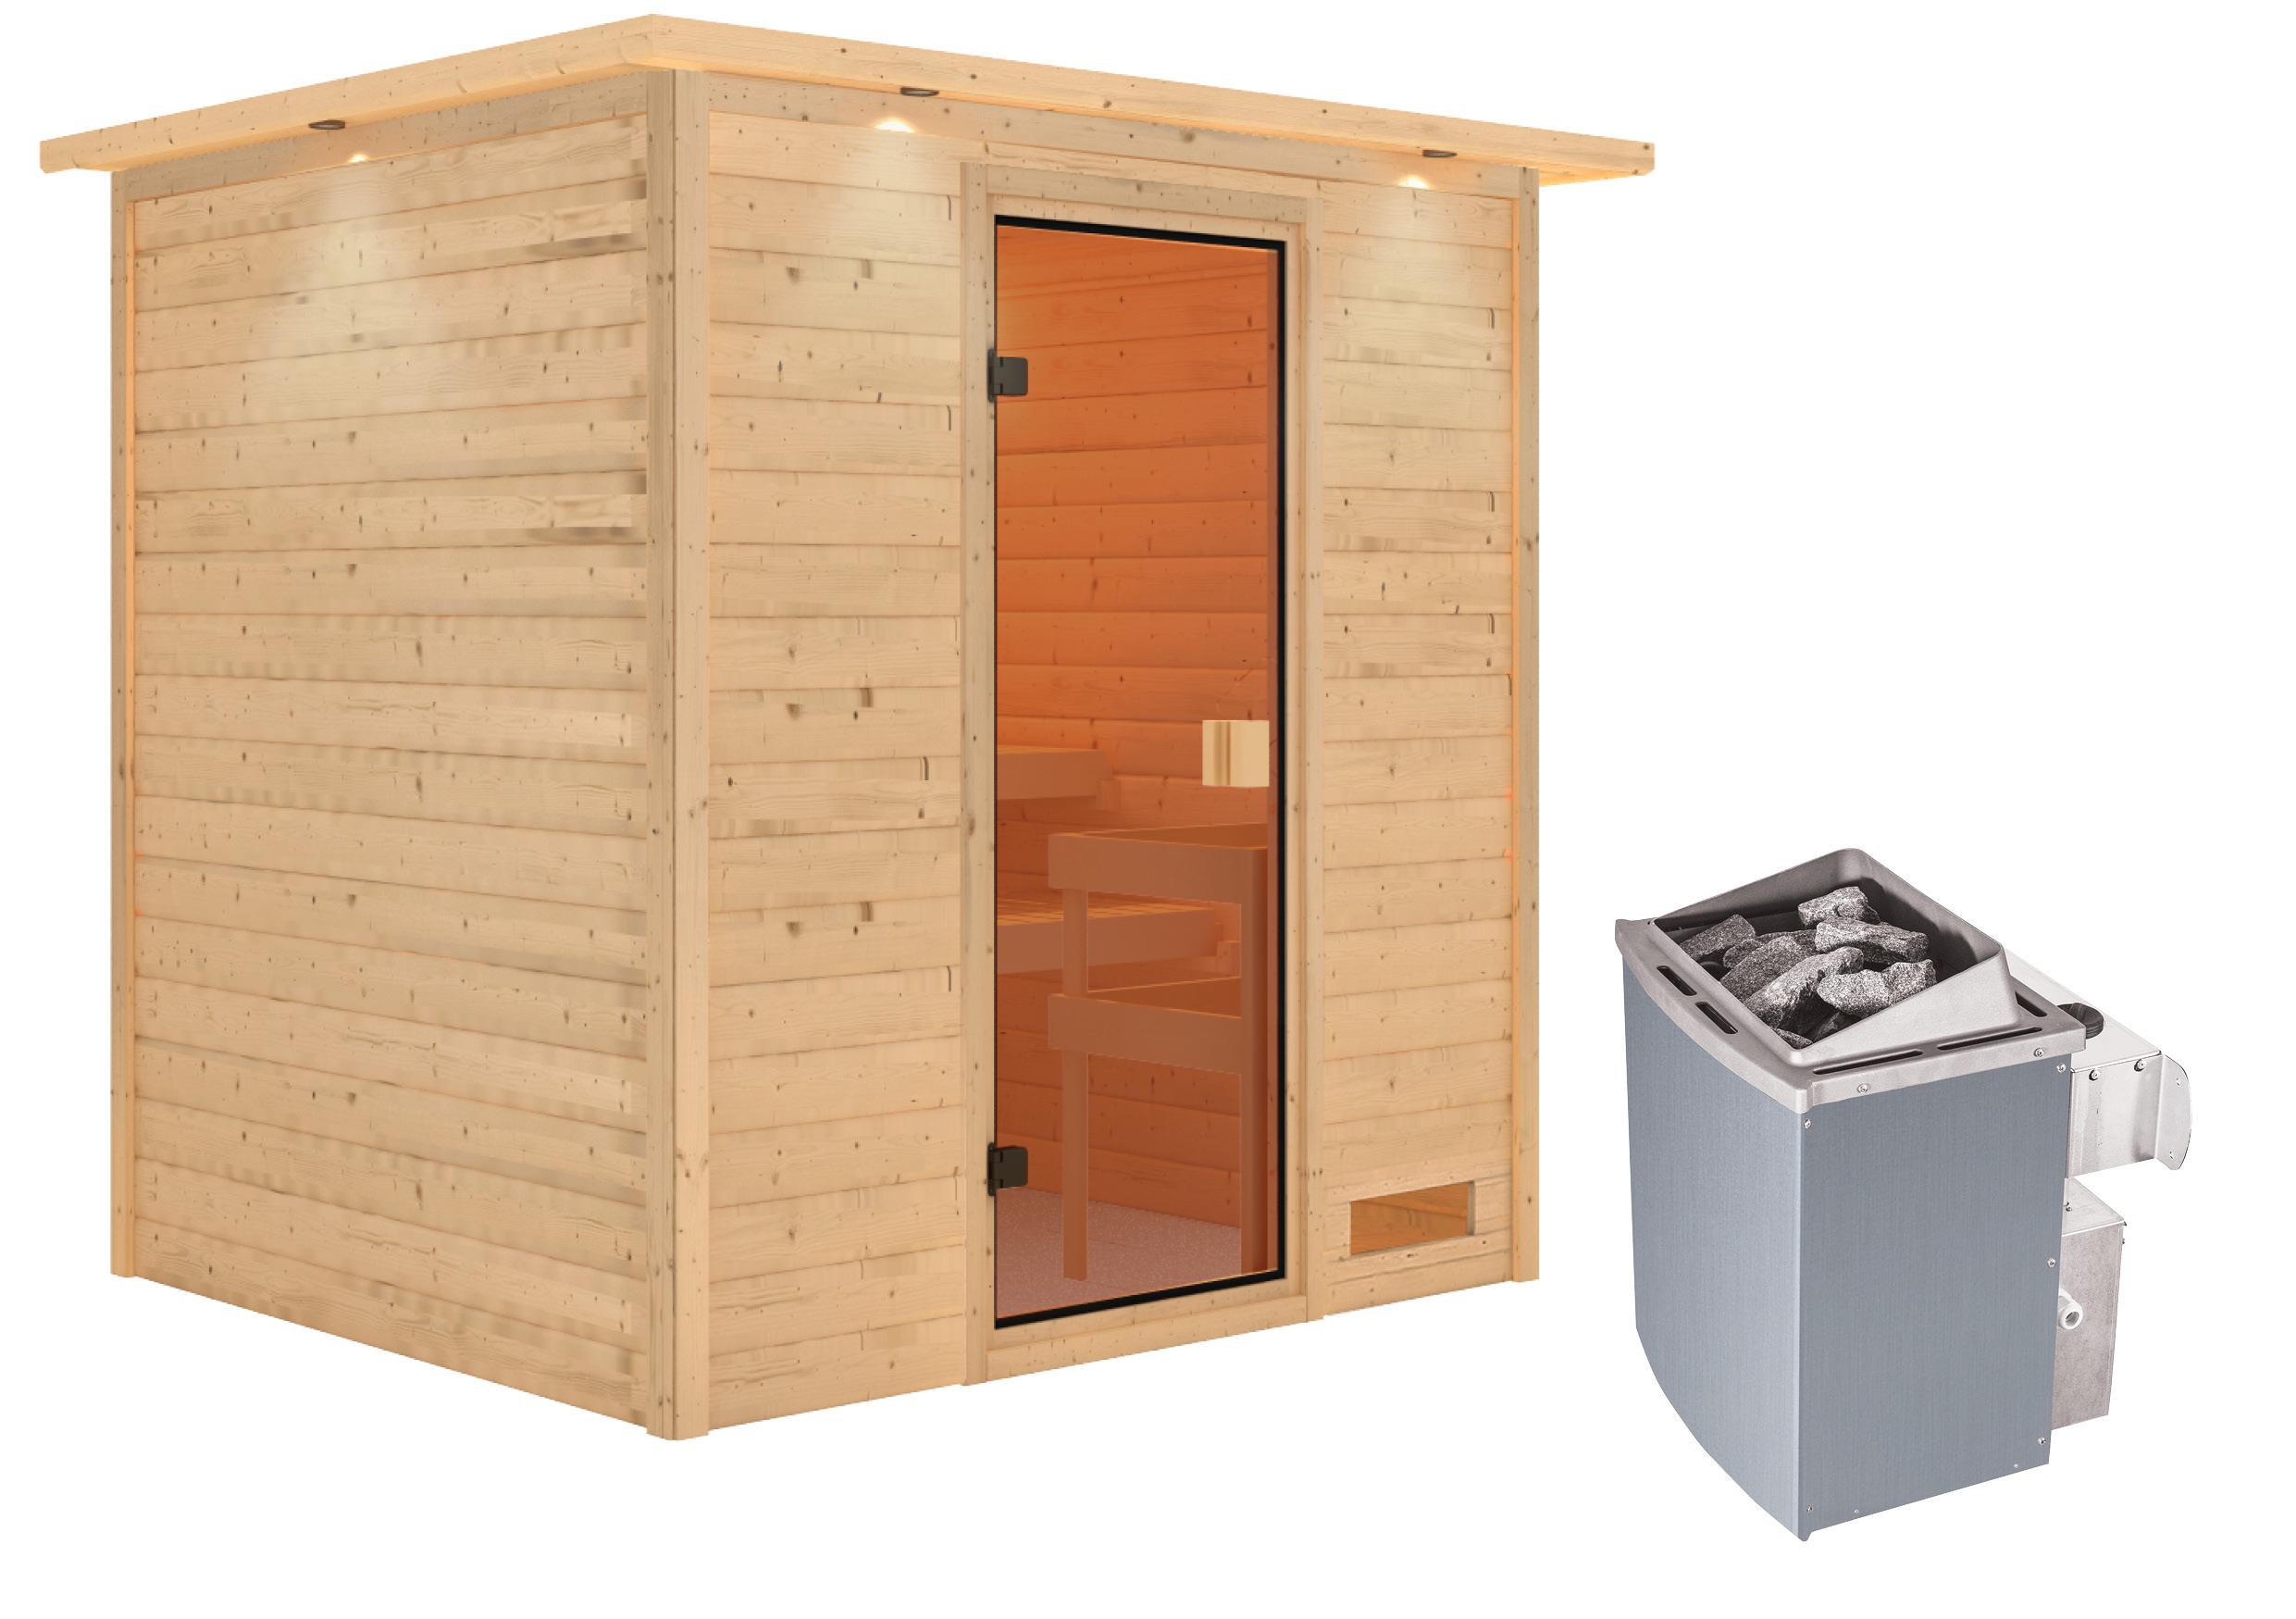 Woodfeeling Sauna Adelina 38mm Dachkranz Saunaofen 9kW intern Bild 2